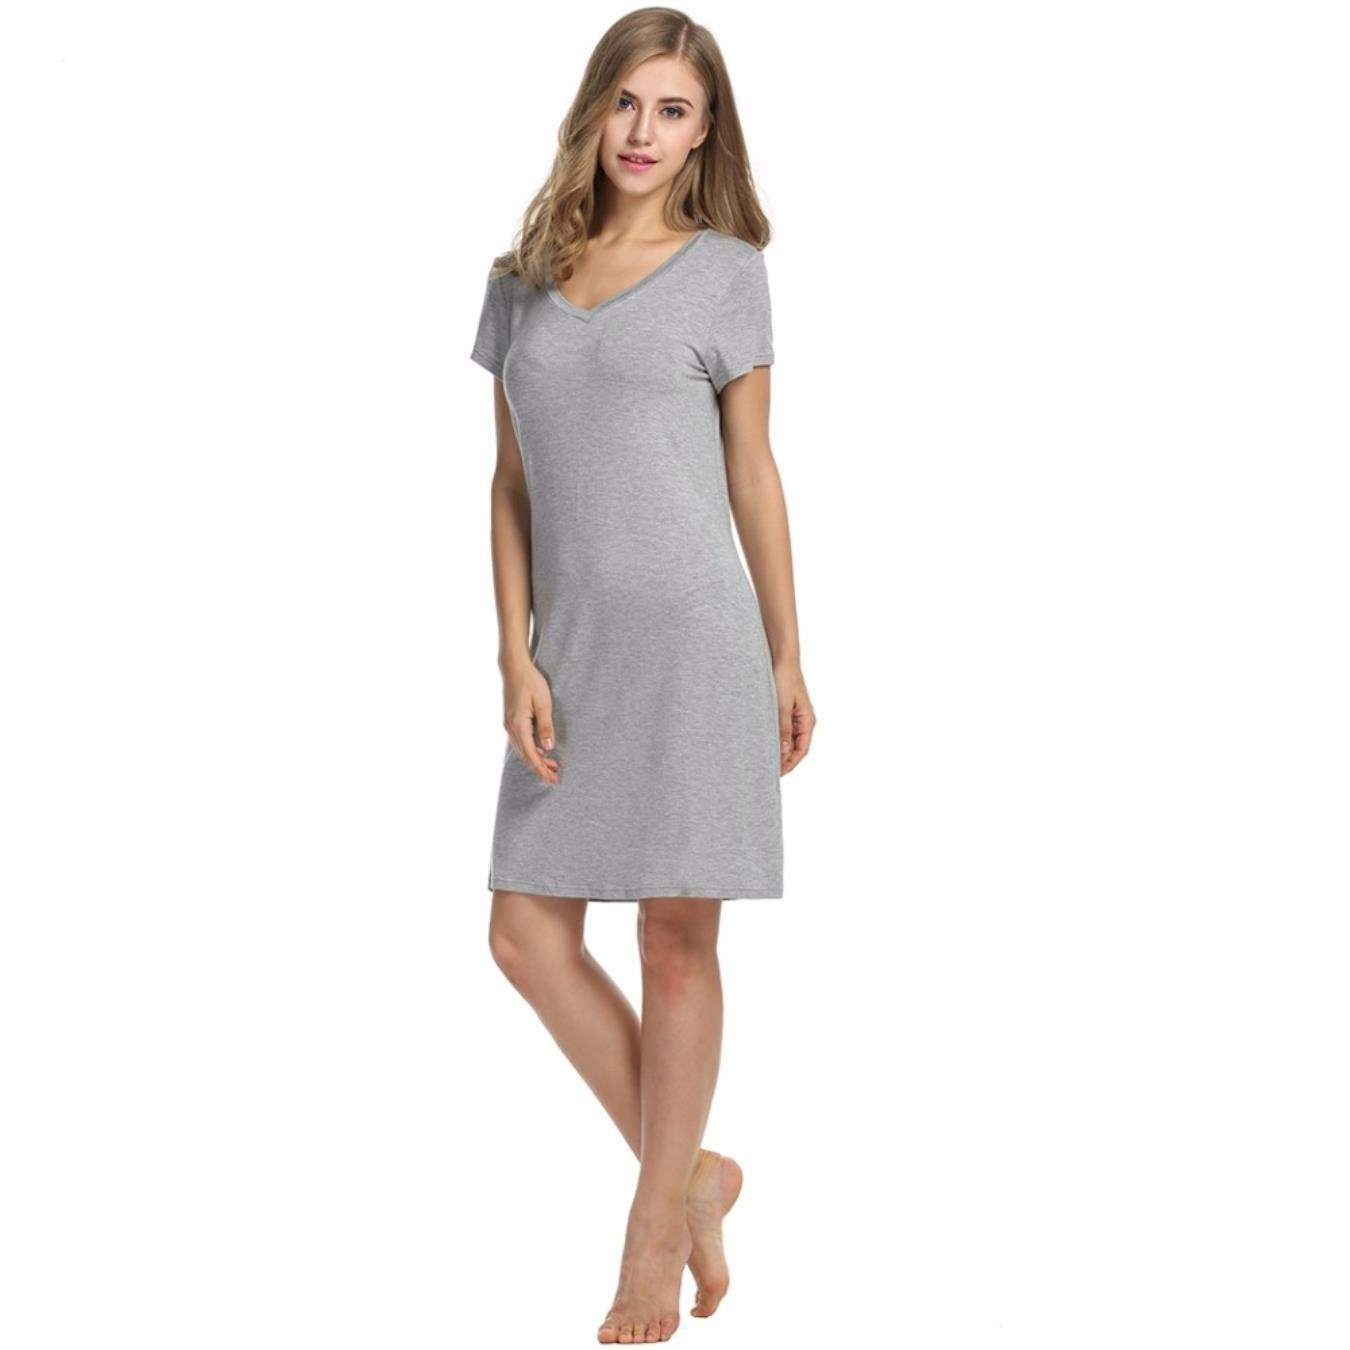 NCOEM Woman Summer Soft Sleep Dress Womens Nightgowns Nightshirts Nightdress V-Neck Nightwear Sleepwear at Amazon Womens Clothing store: